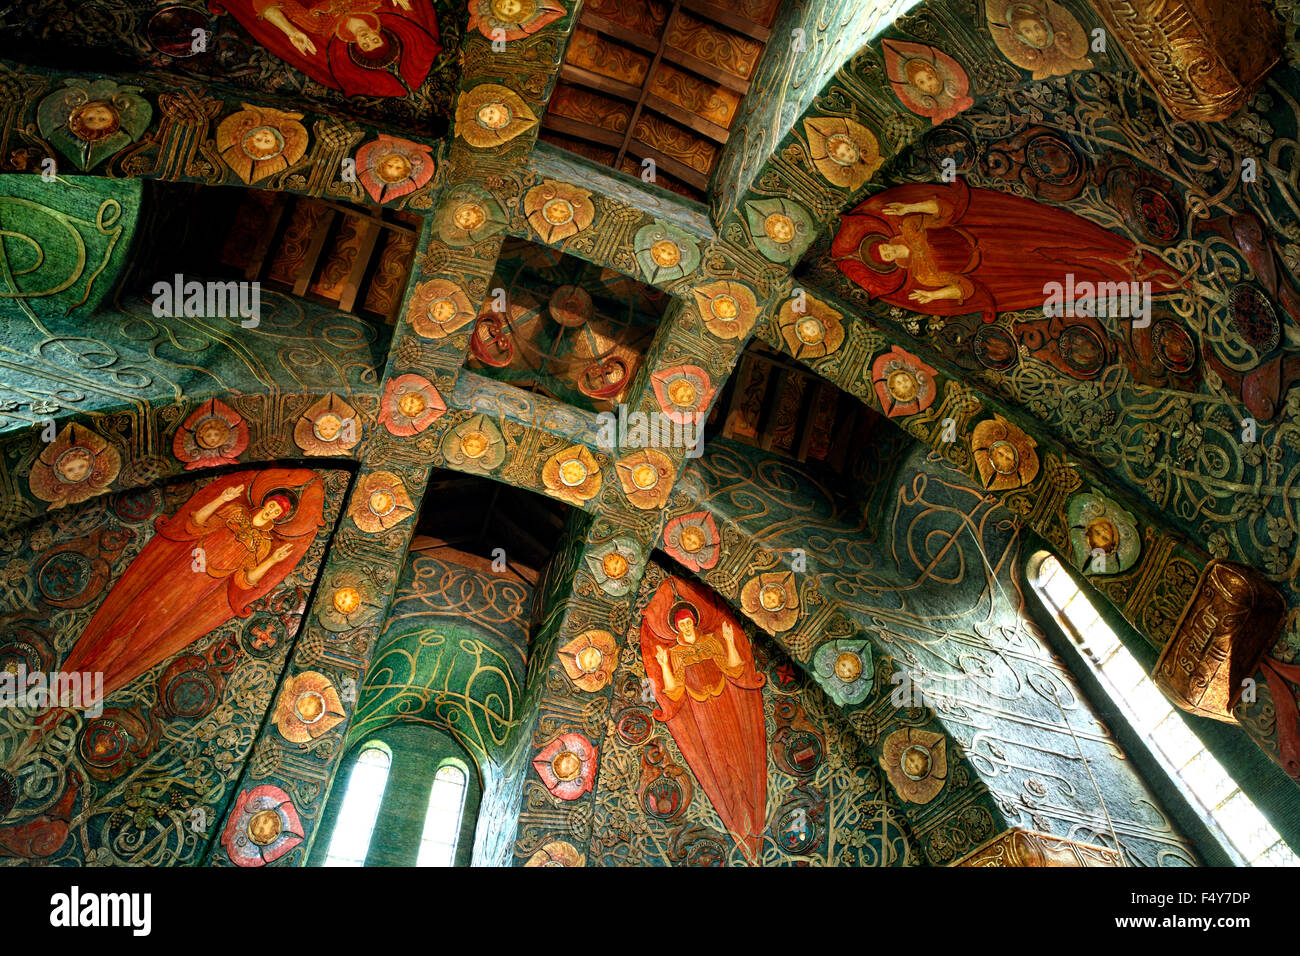 Die kunstvoll verzierten Decke der Kapelle Watt. Stockbild